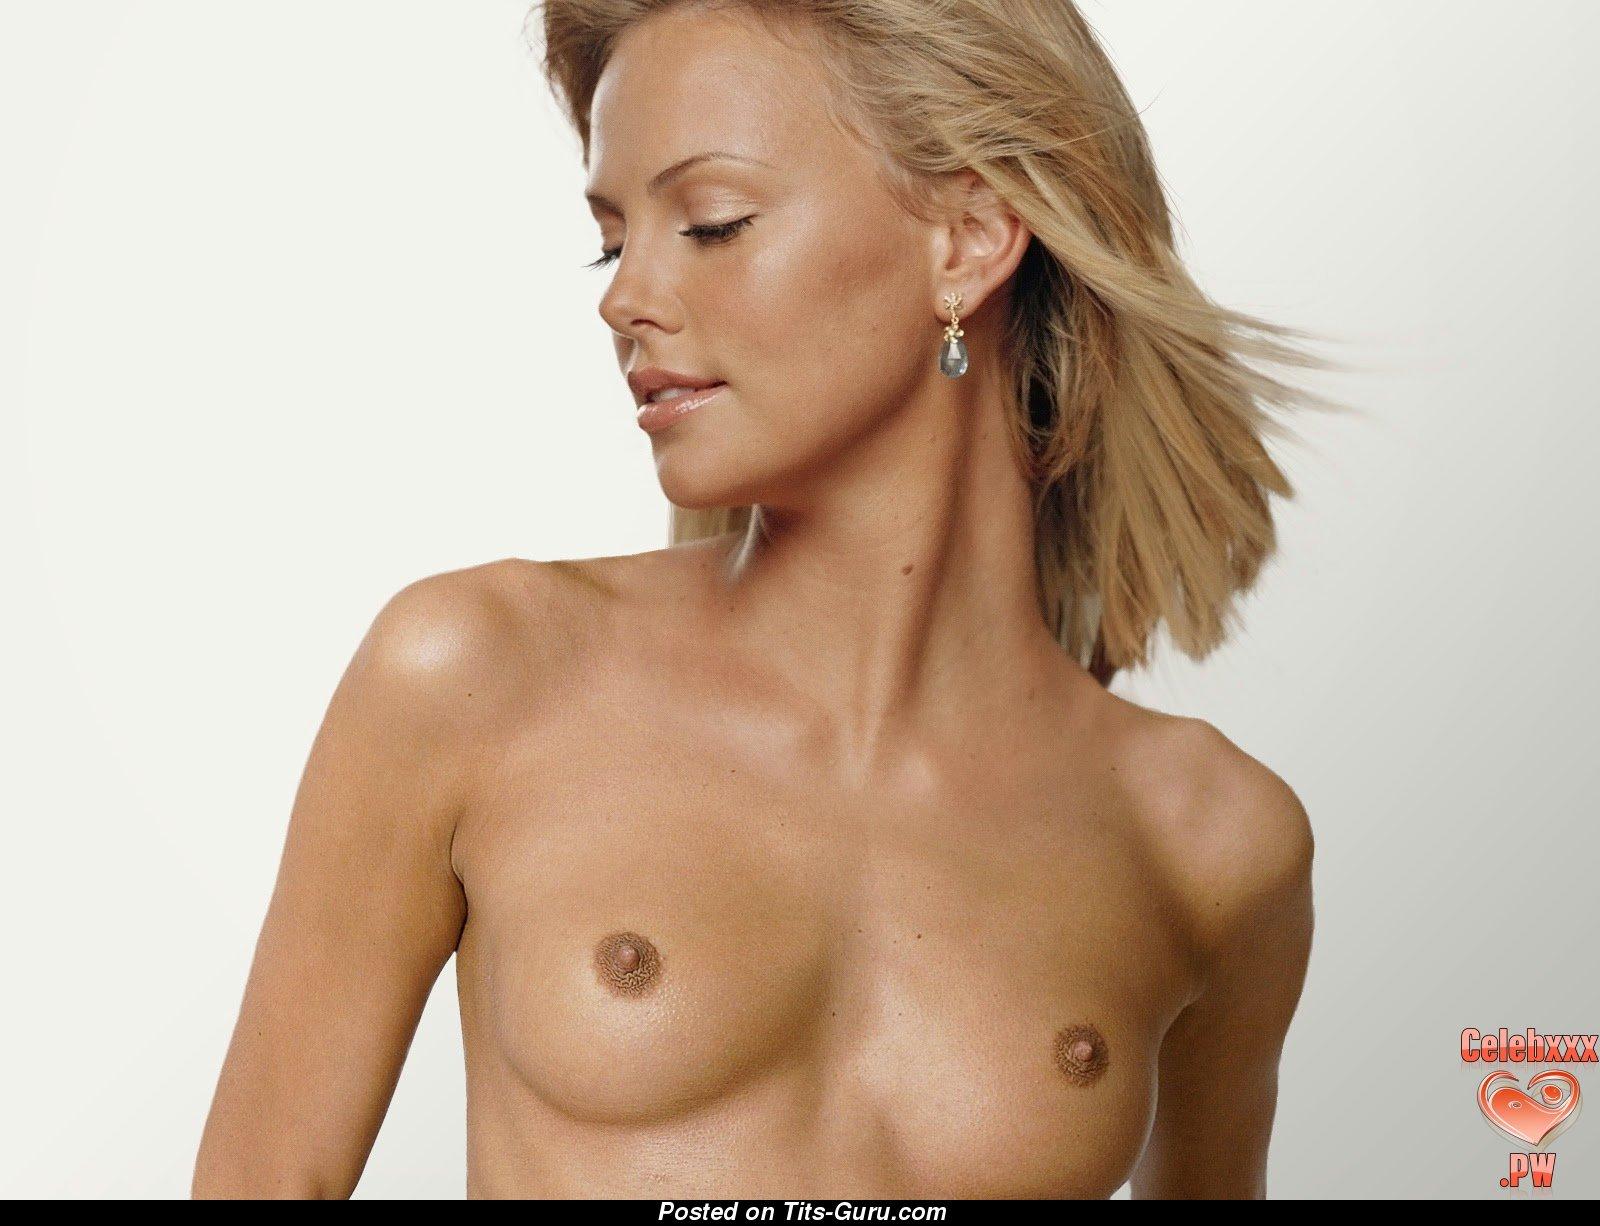 Charlize Theron Sexy Naked Wonderful Lady Pic